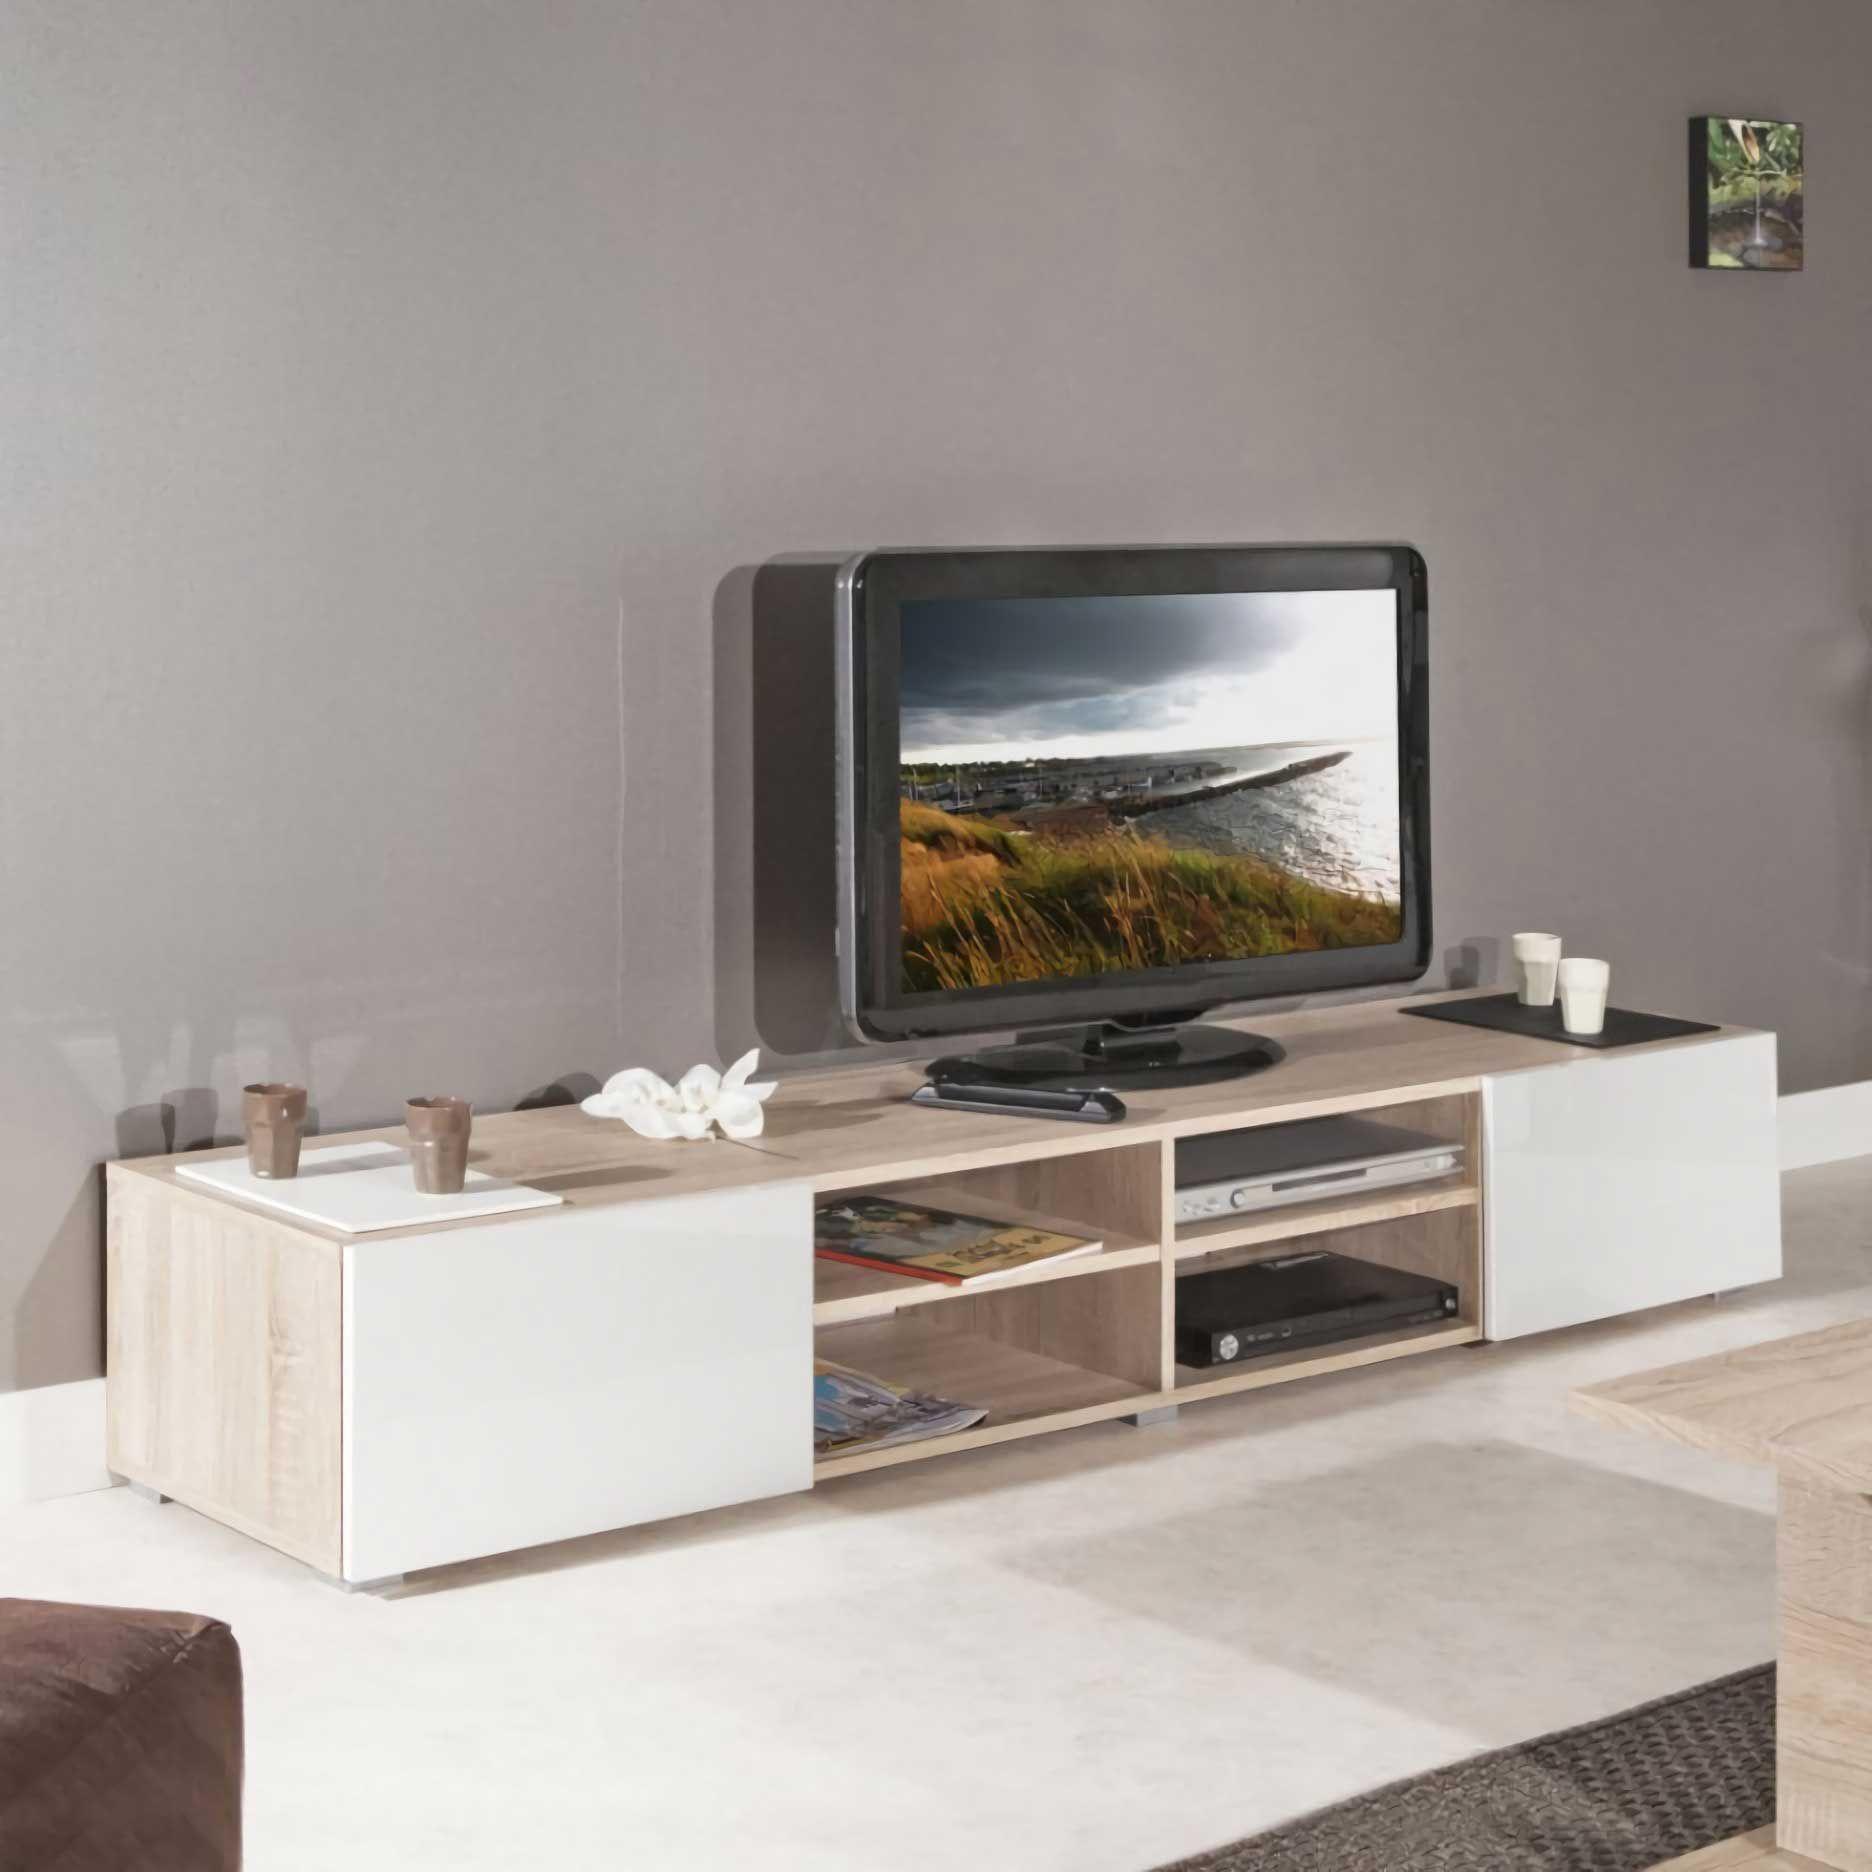 Ikea Meuble Blanc Laqué petit incroyable meuble tv blanc laque ikea meuble tv ikea